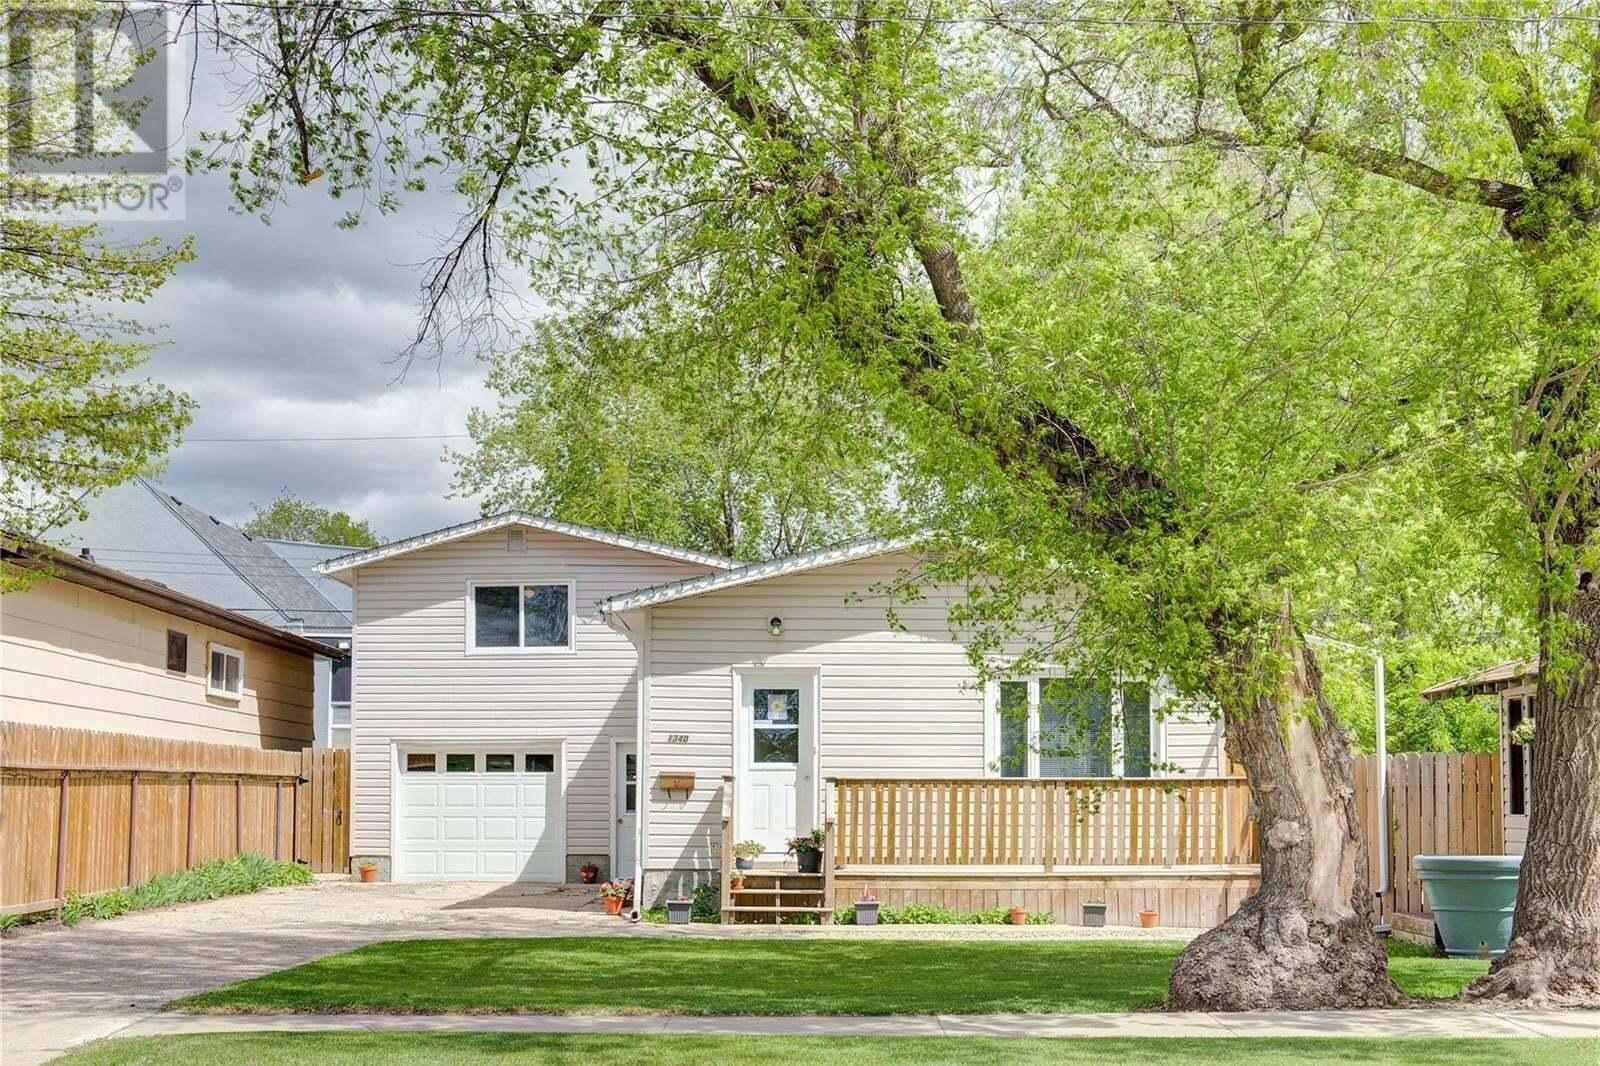 House for sale at 1340 E Ave N Saskatoon Saskatchewan - MLS: SK810035